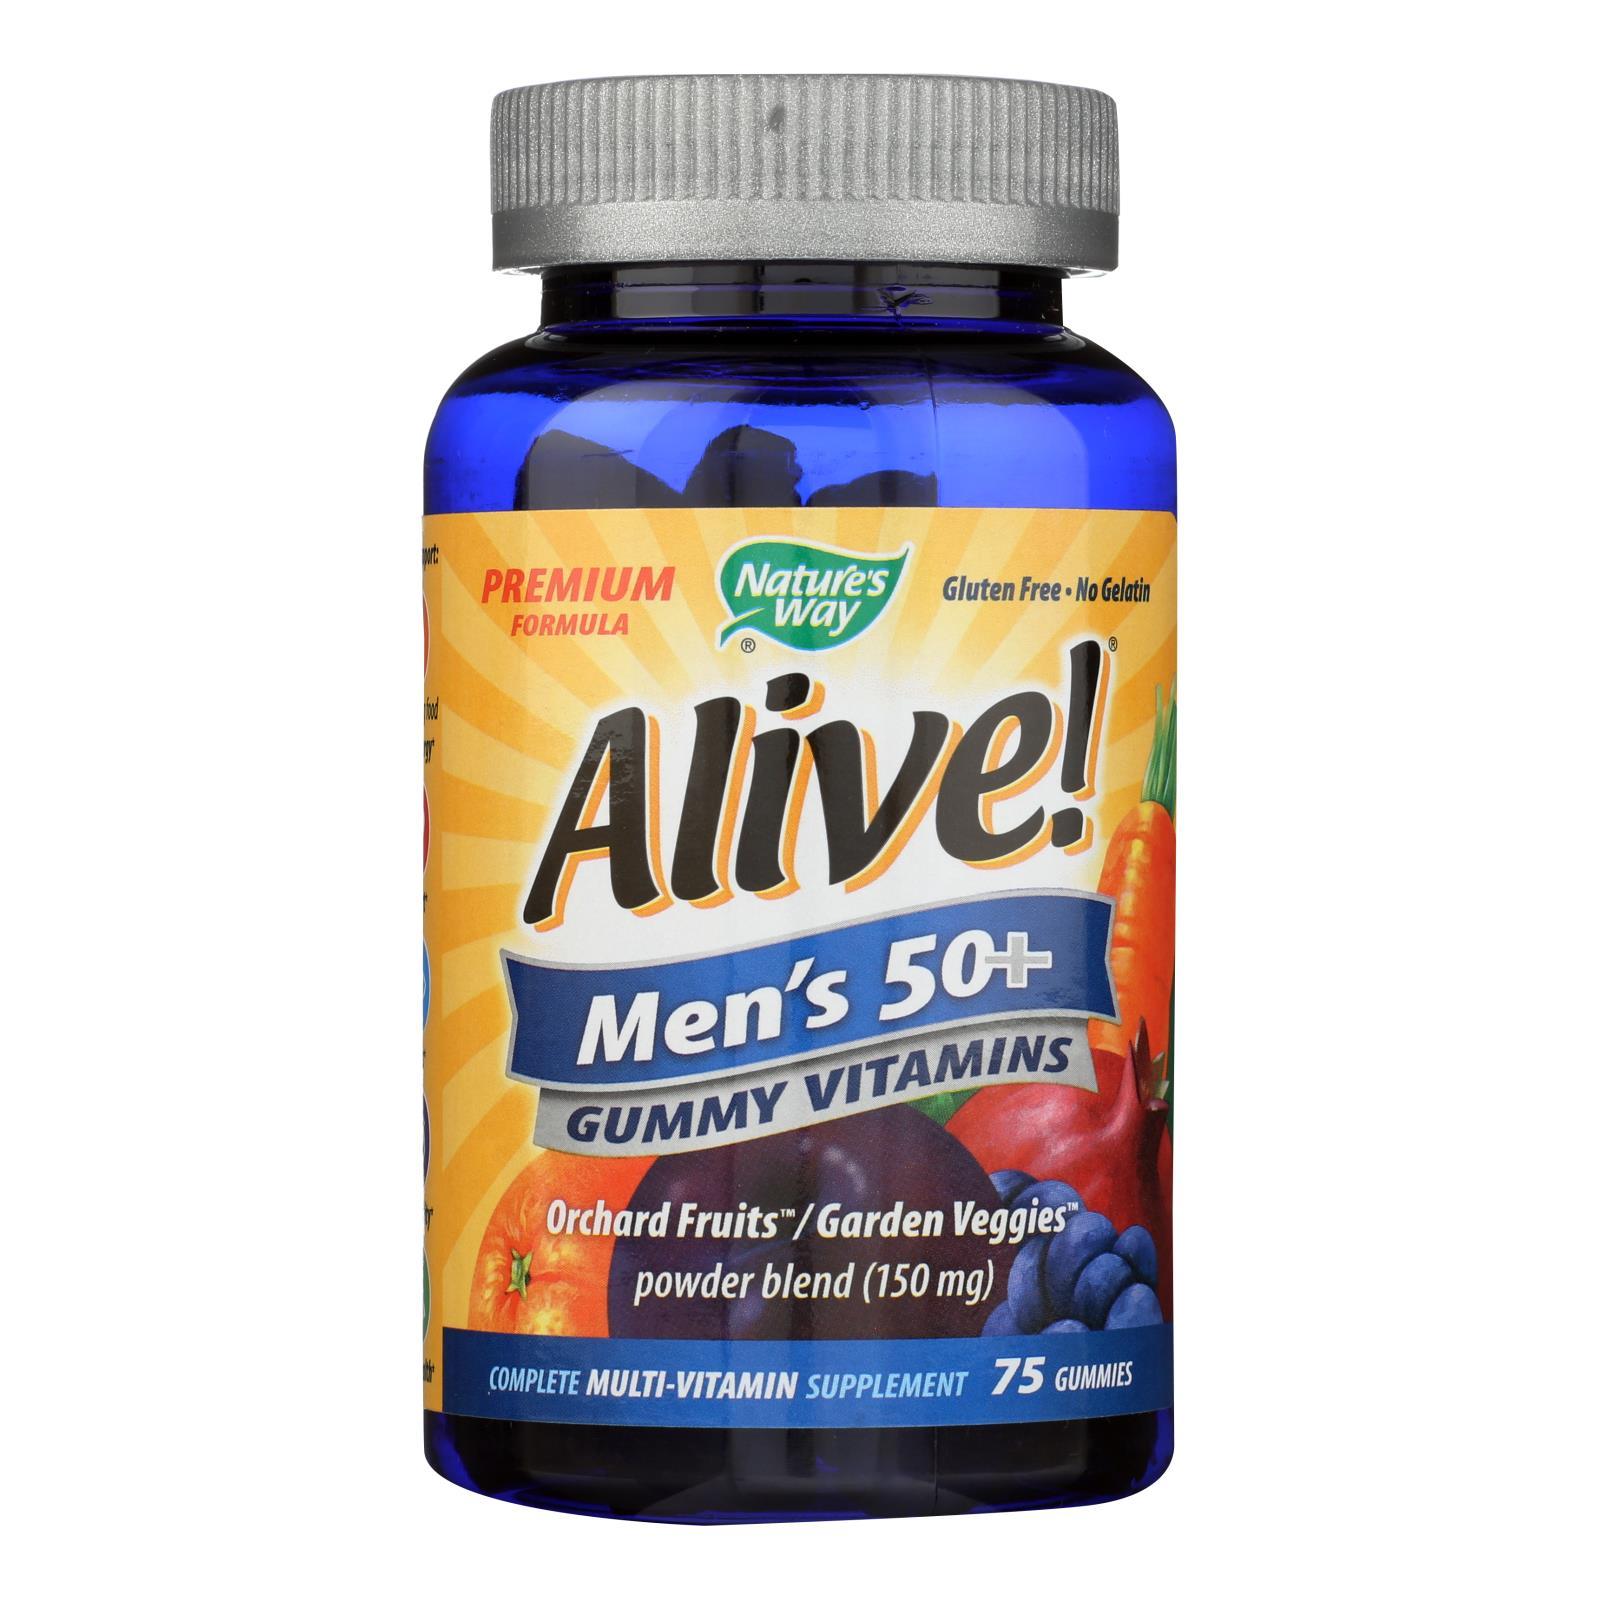 Vitamins & Multivitamins